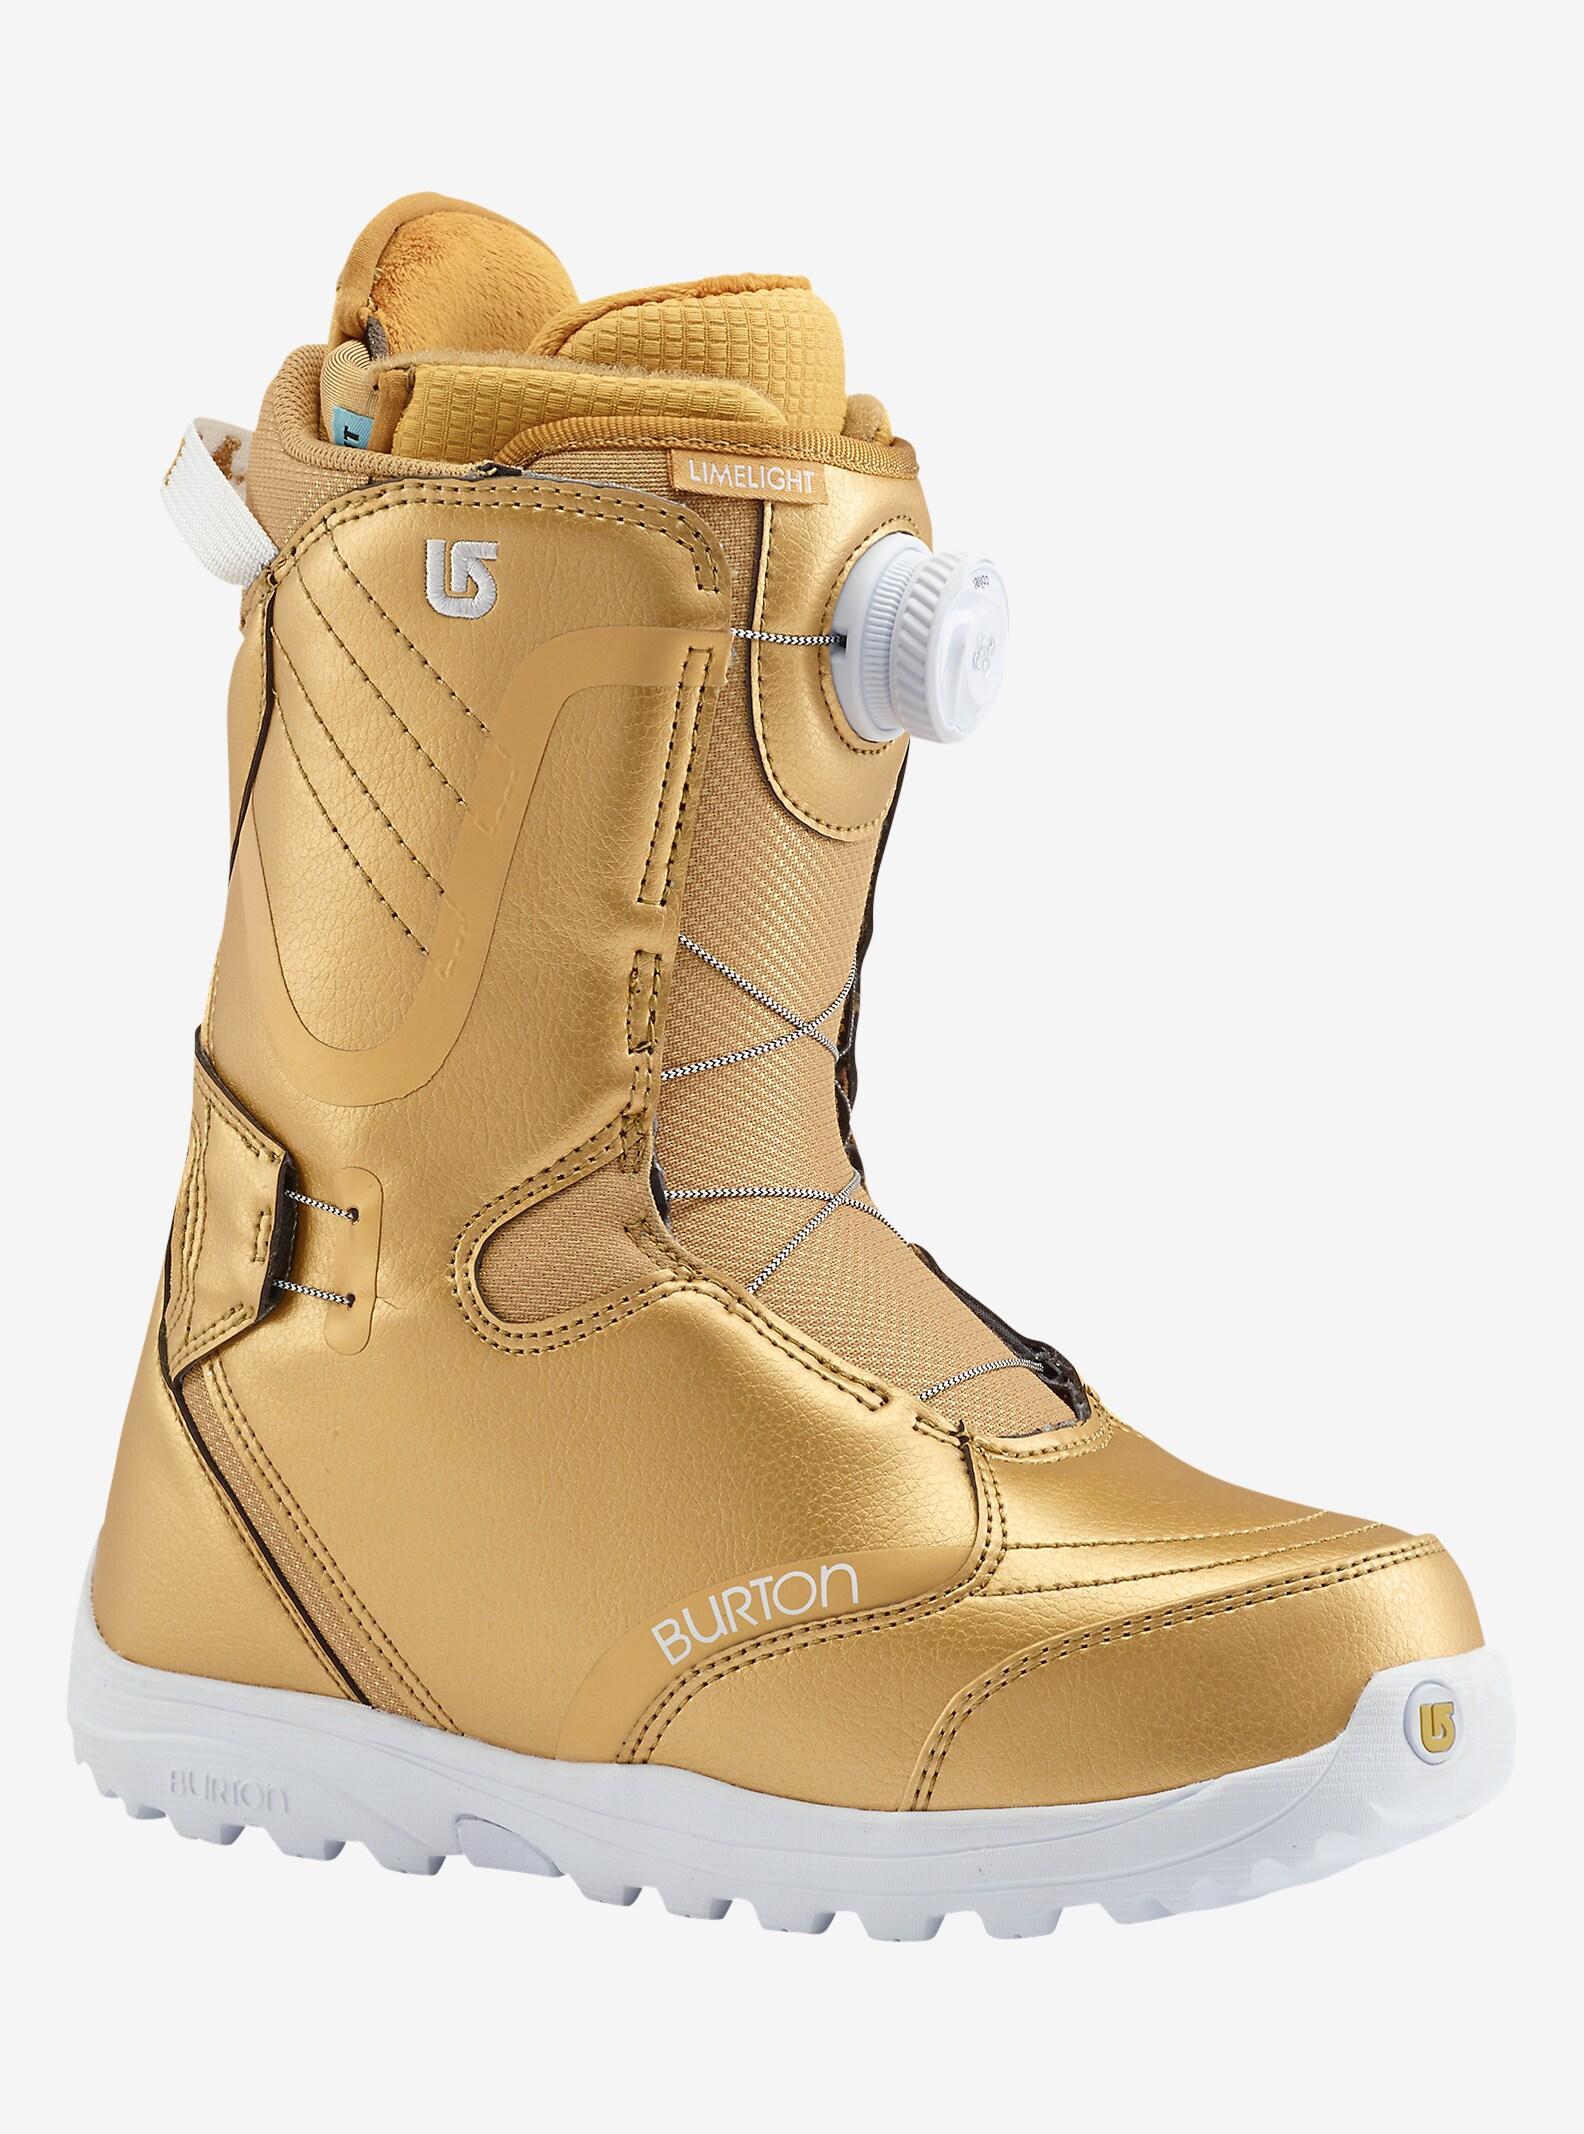 L.A.M.B. x Burton Limelight Boa® Snowboard Boot shown in L.A.M.B.